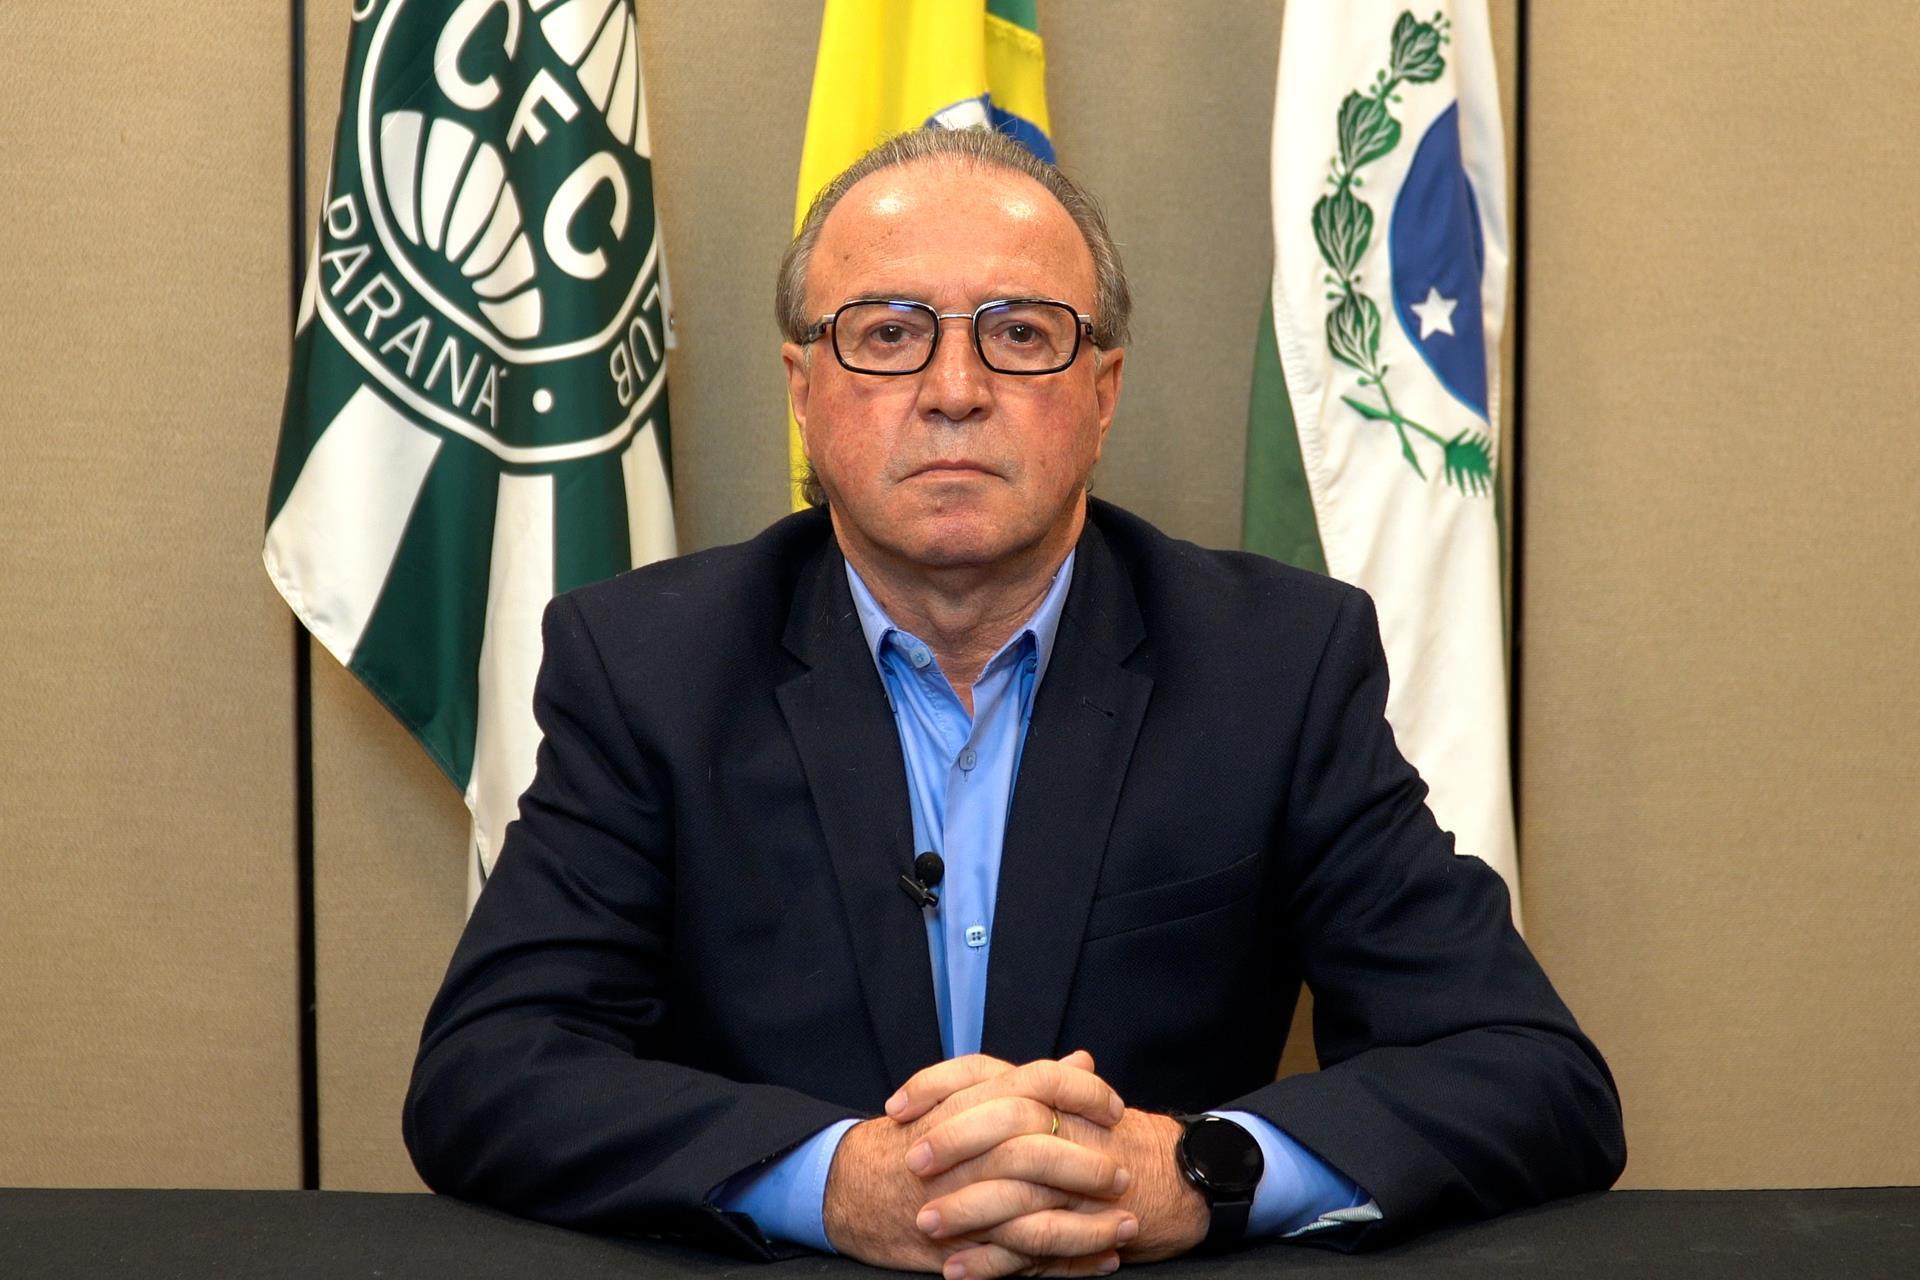 Presidente do Coritiba morreu neste sábado